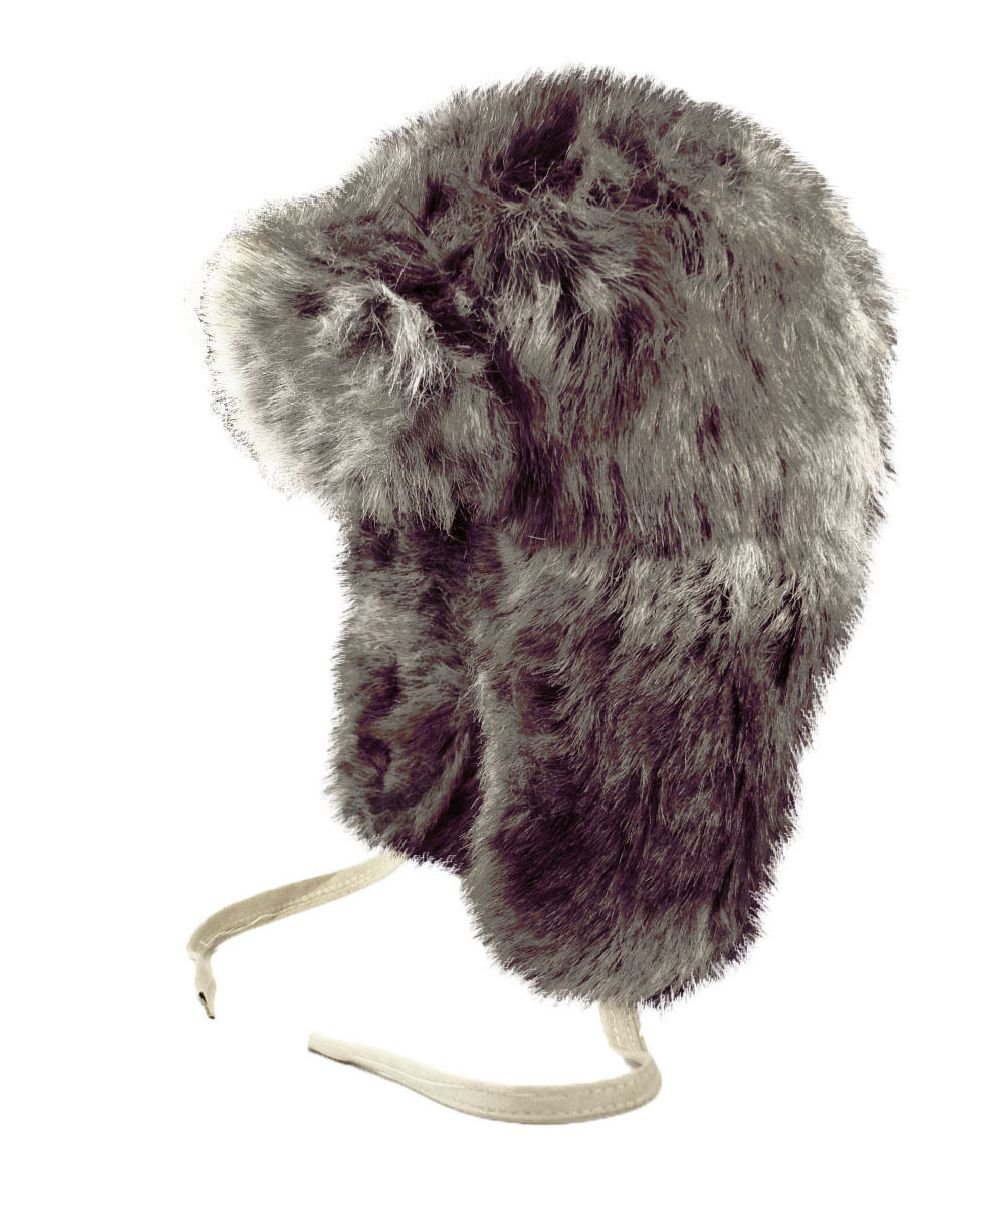 4d67f67f7c6345 Dennis Warm series New Unisex Mens Ladies Luxury Russian cossack Ski  Trapper Hat Faux Fur Winter Warm EMSYI121782177204